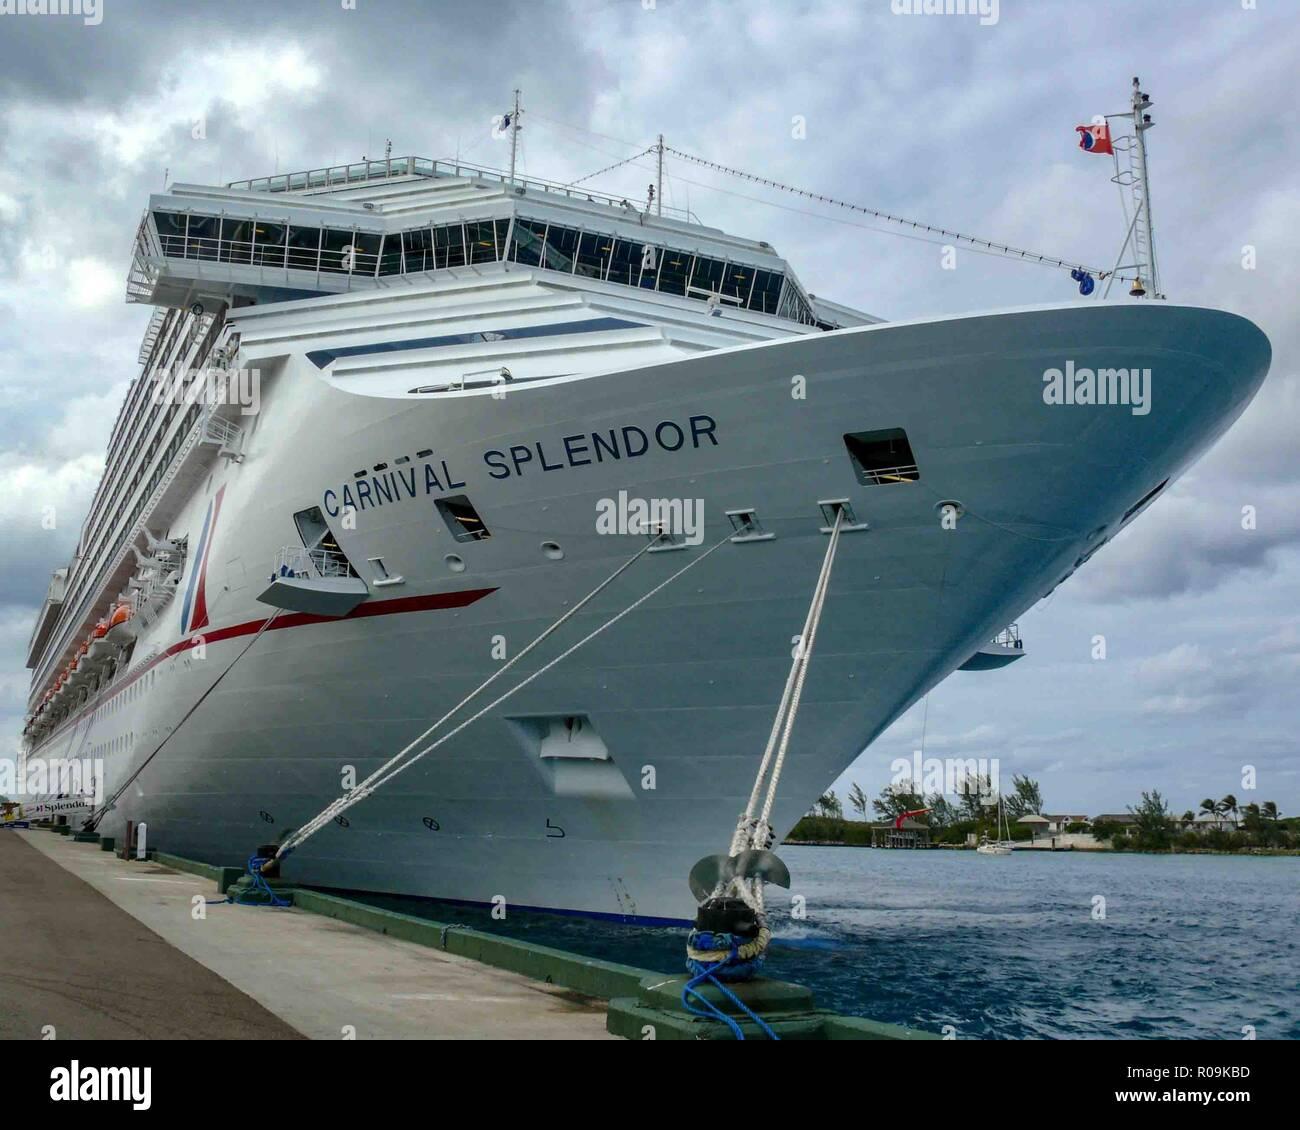 Carnival Splendor Cruise Ship Stock Photos Amp Carnival